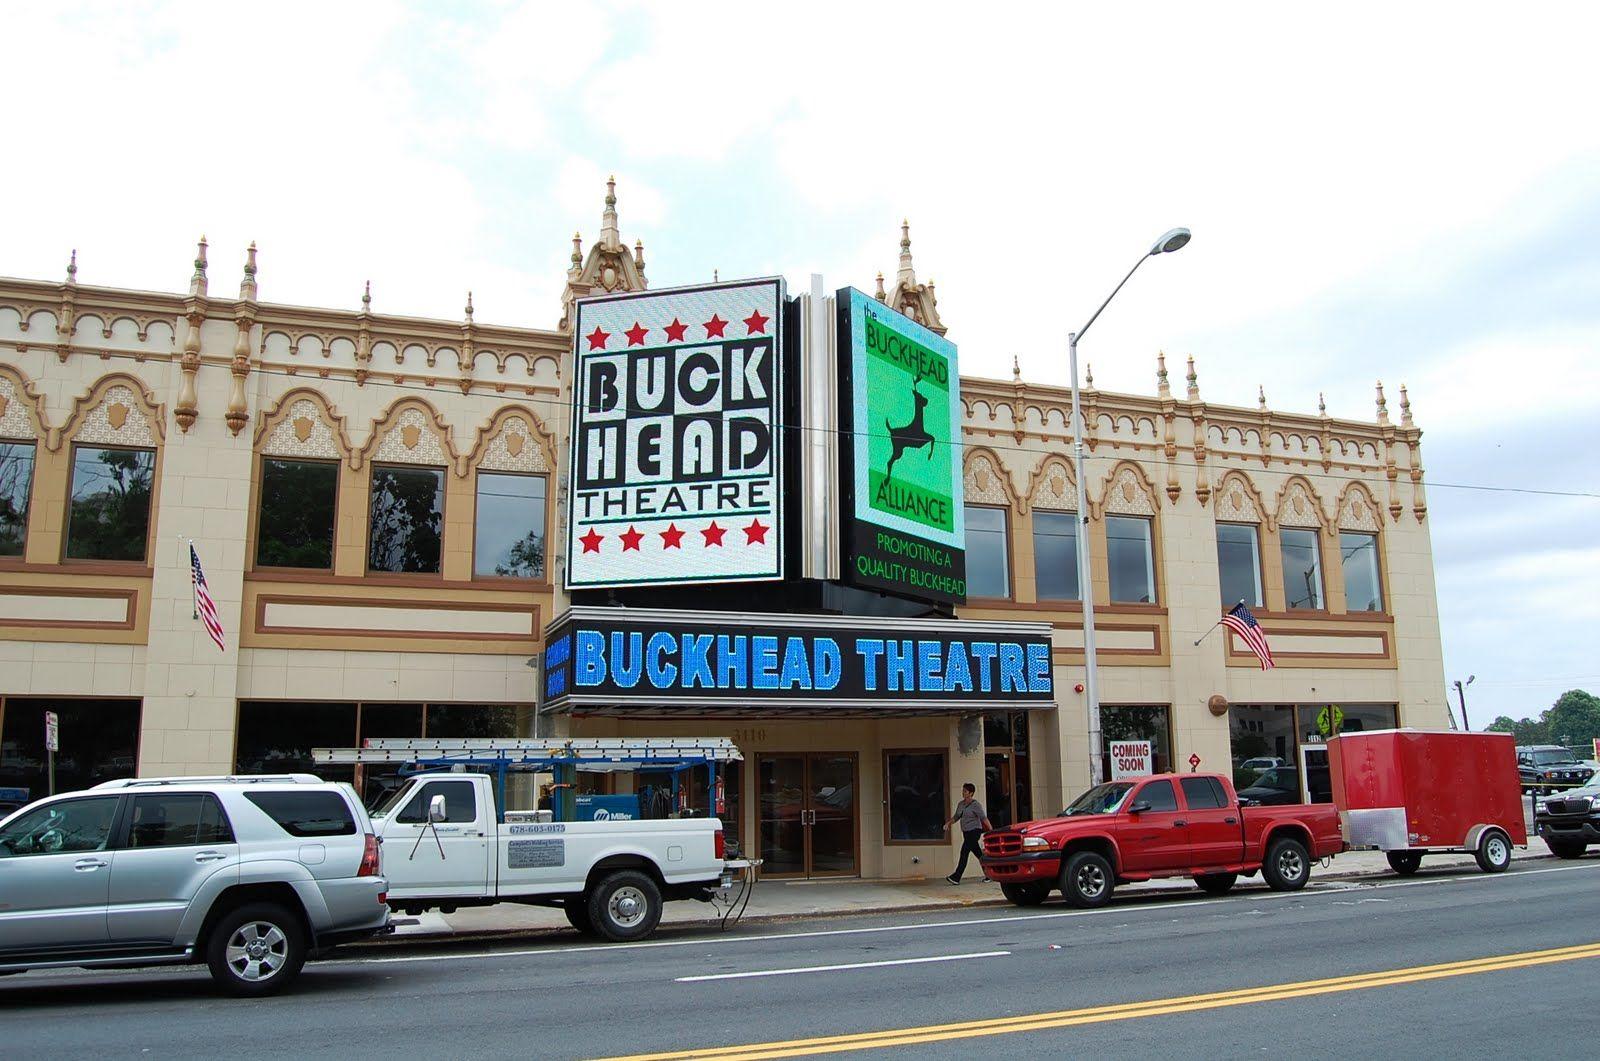 Buckhead Theater Buckhead, The neighbourhood, Buckhead